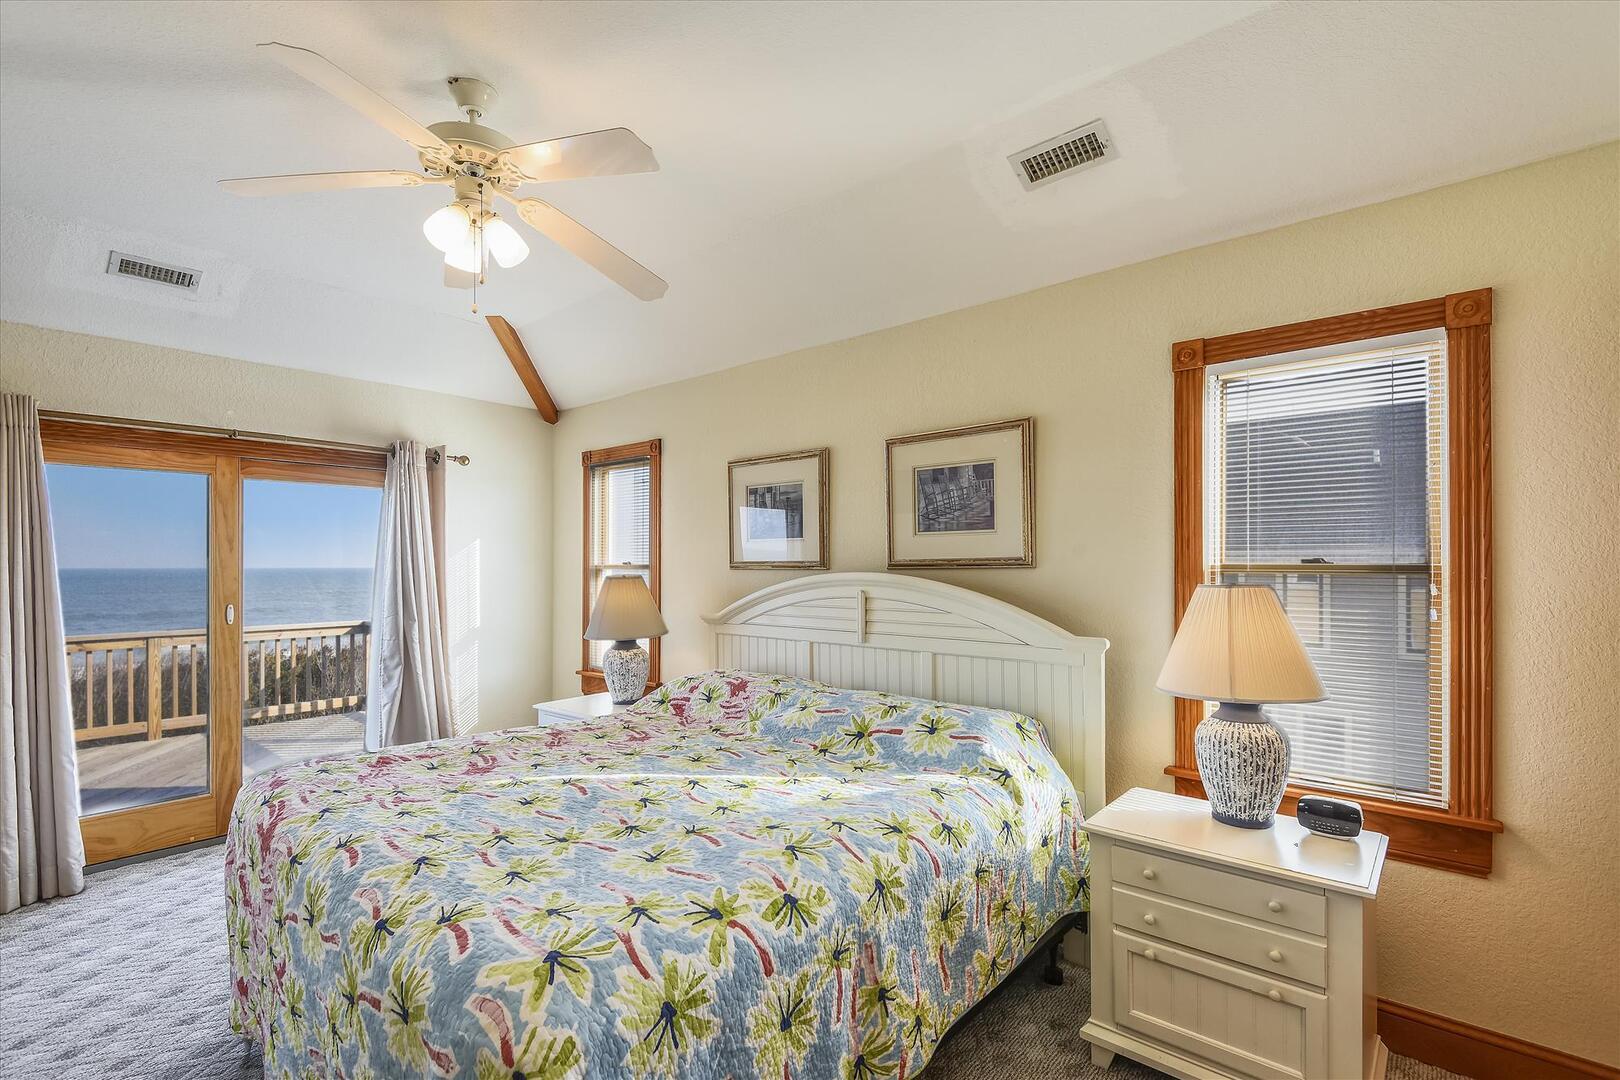 Upper/Main Level,Bedroom,